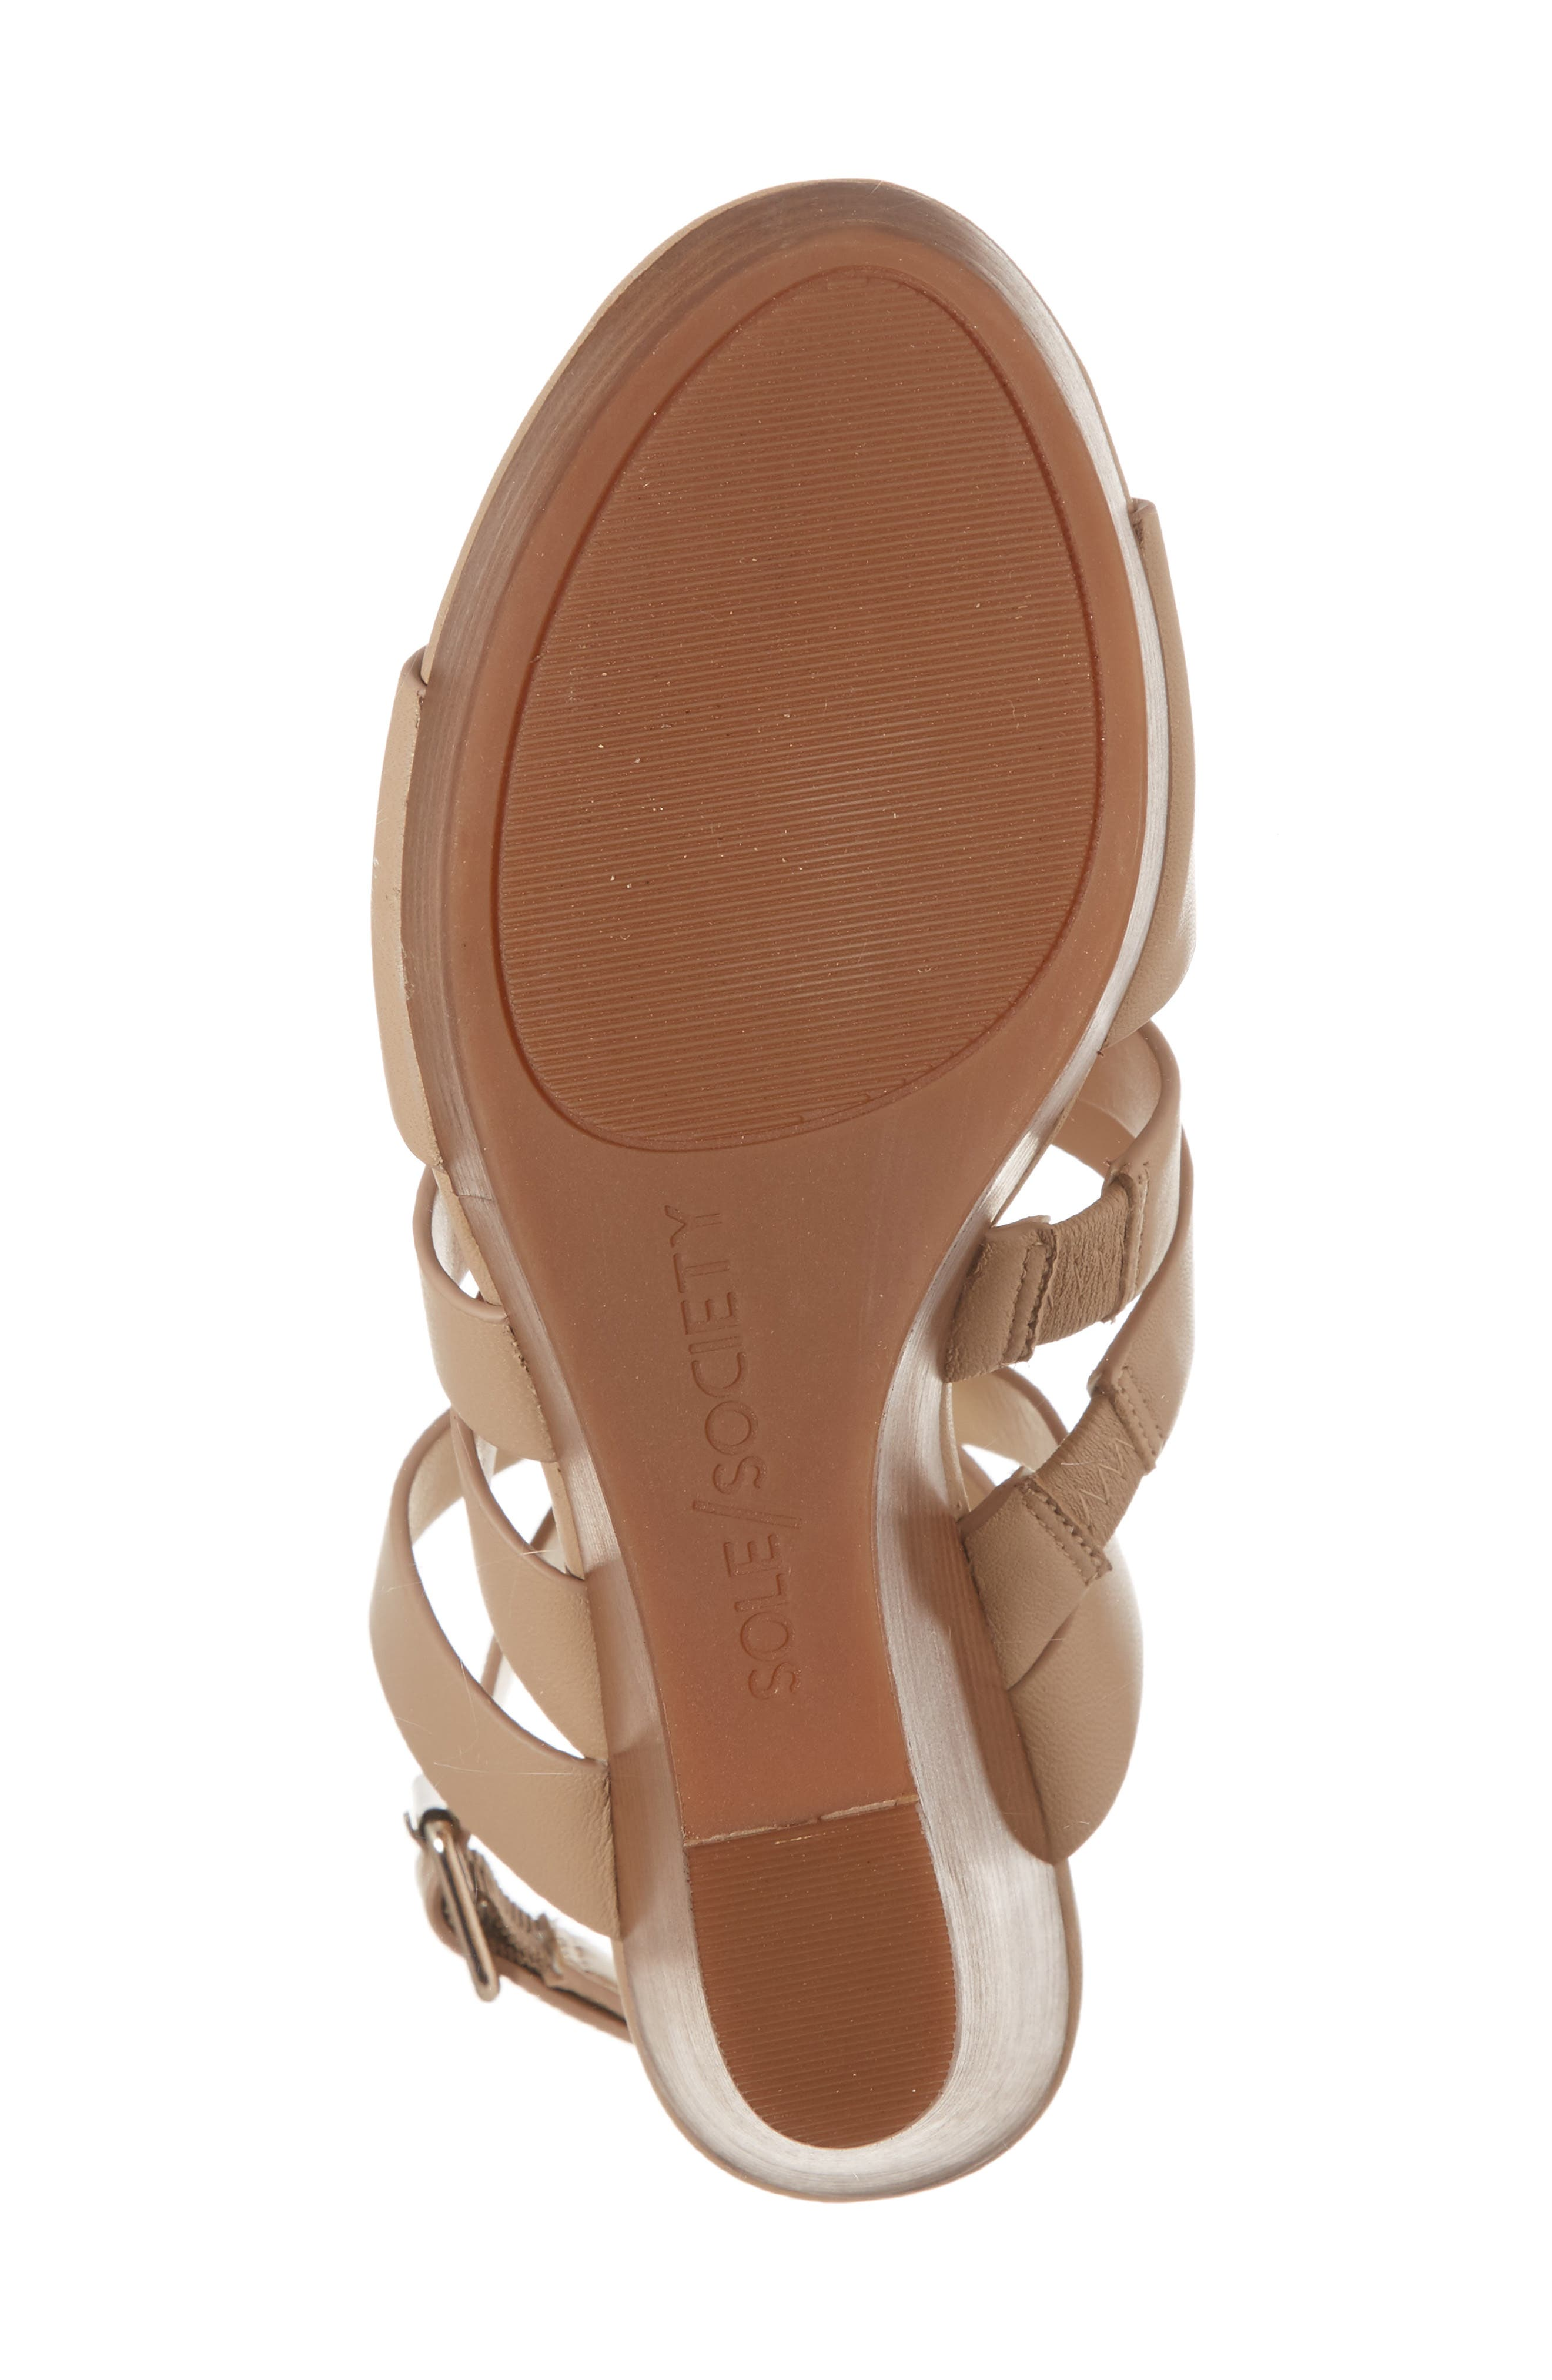 SOLE SOCIETY, Pippy Platform Sandal, Alternate thumbnail 6, color, TAN